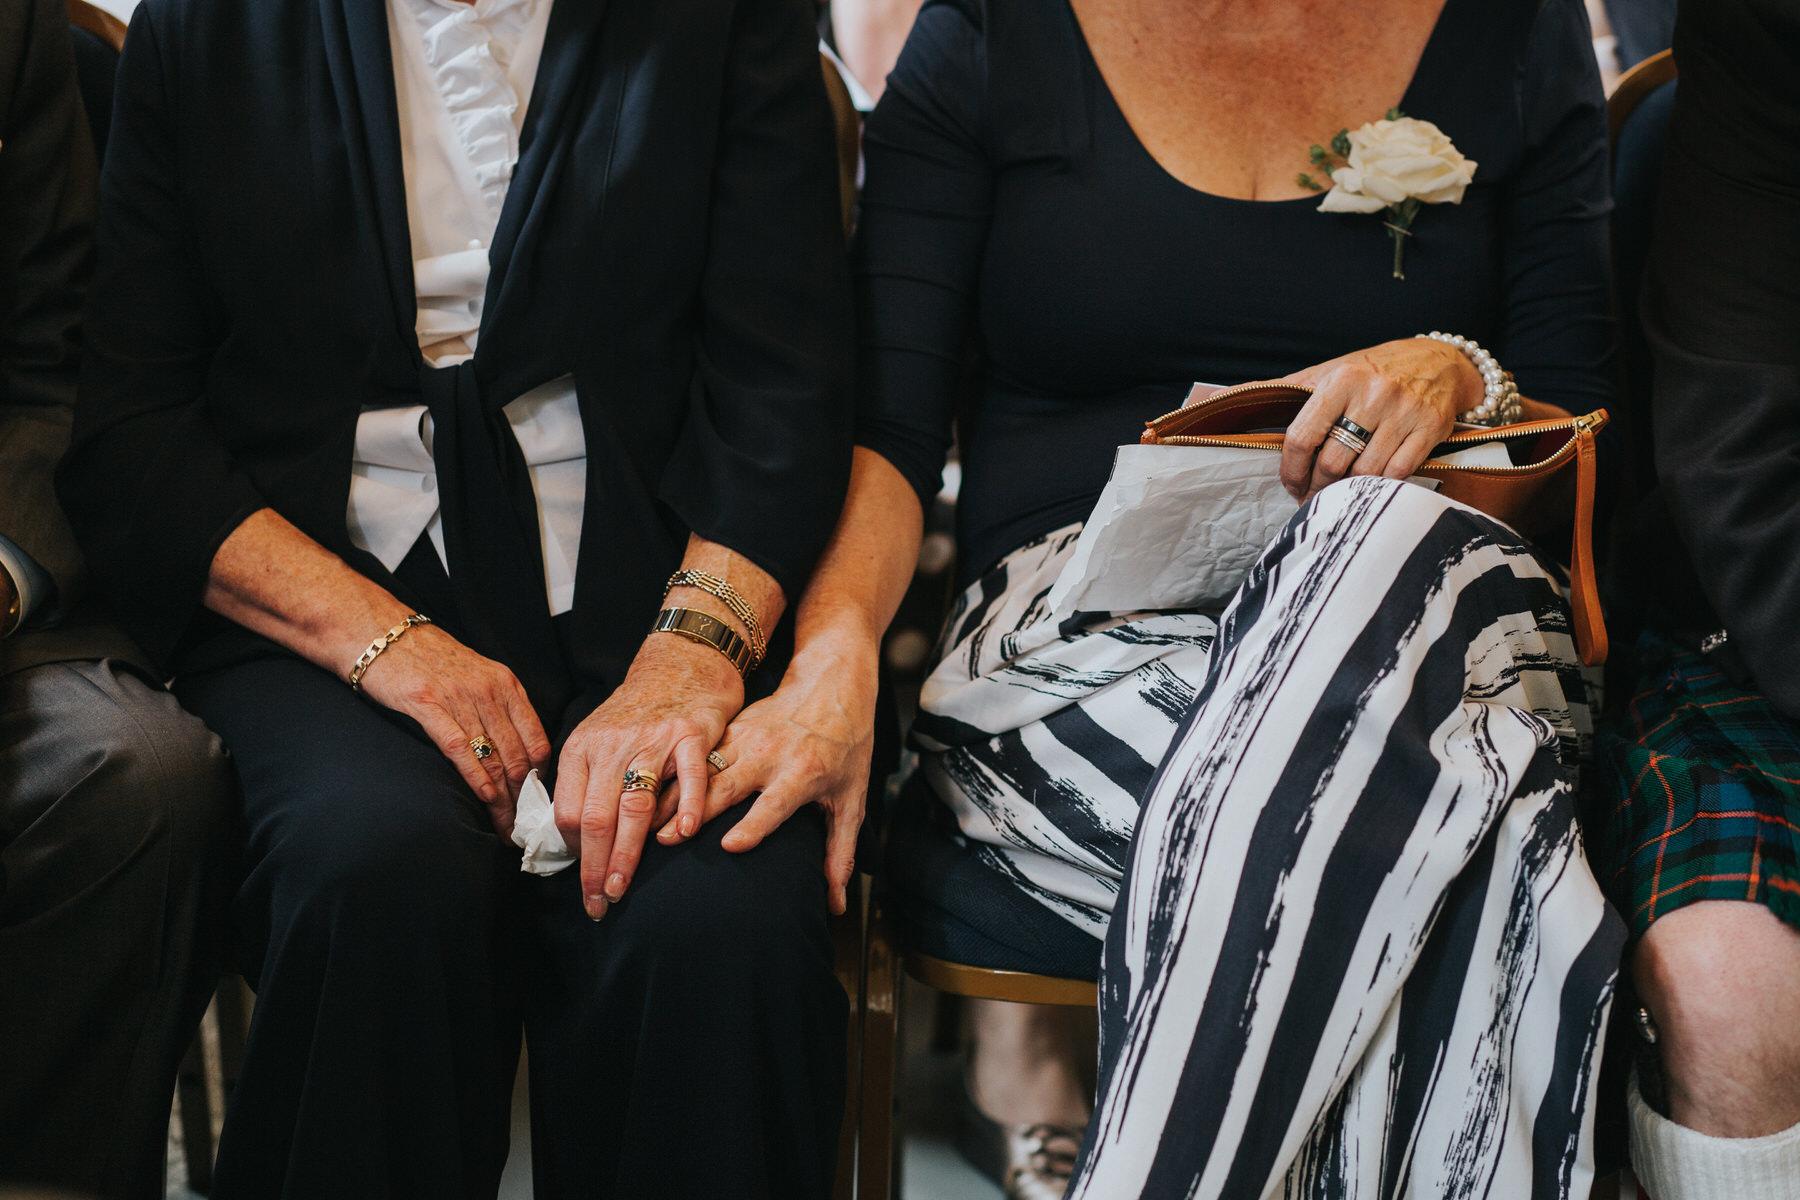 102 sister holding mums hand emotional wedding ceremony two brides.jpg